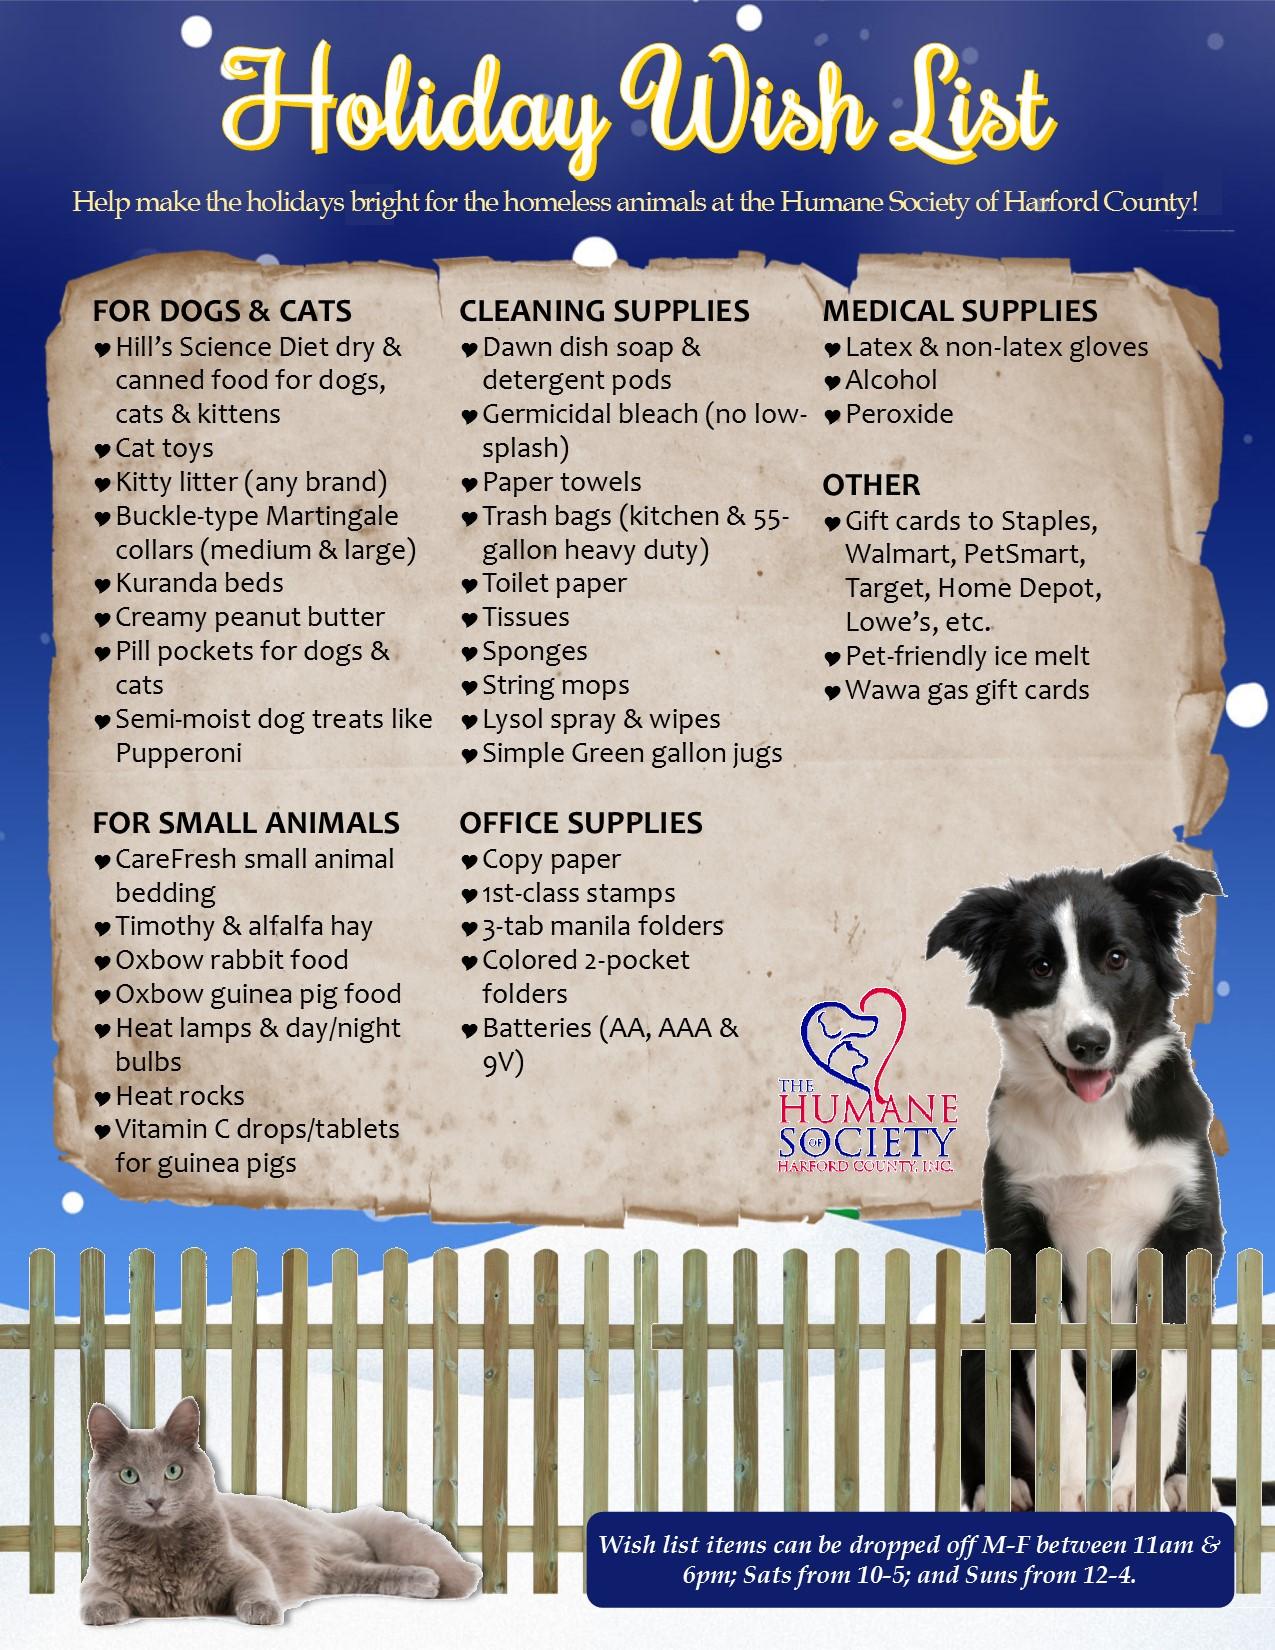 Holiday Wish List The Humane Society Of Harford County